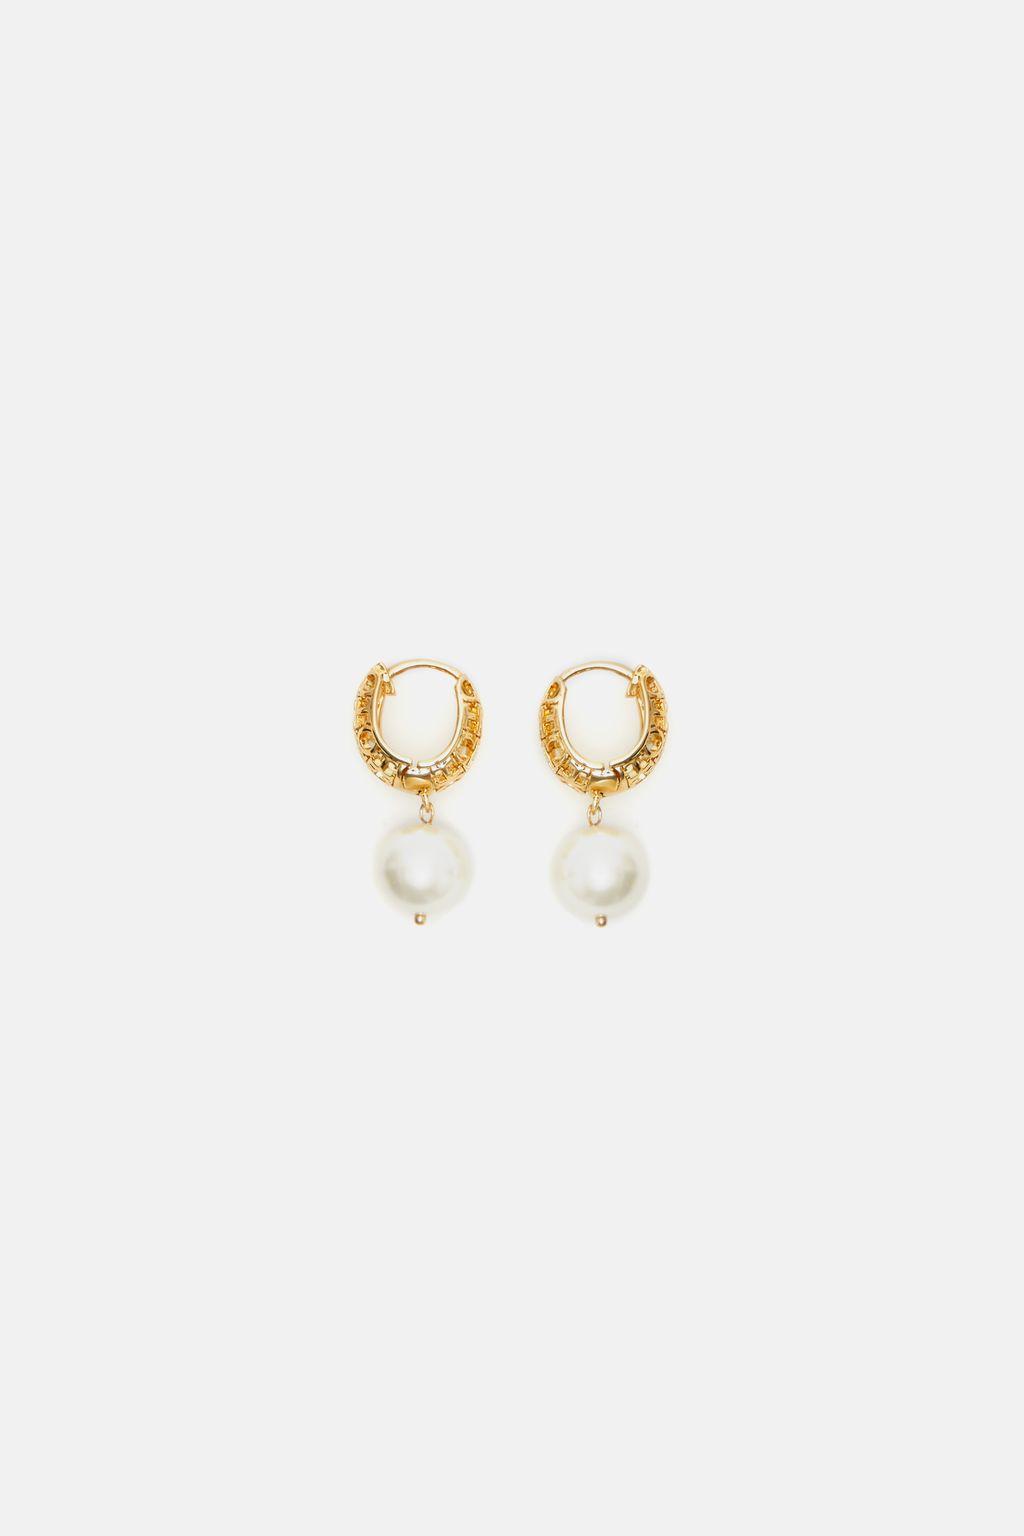 CH Maillon earrings